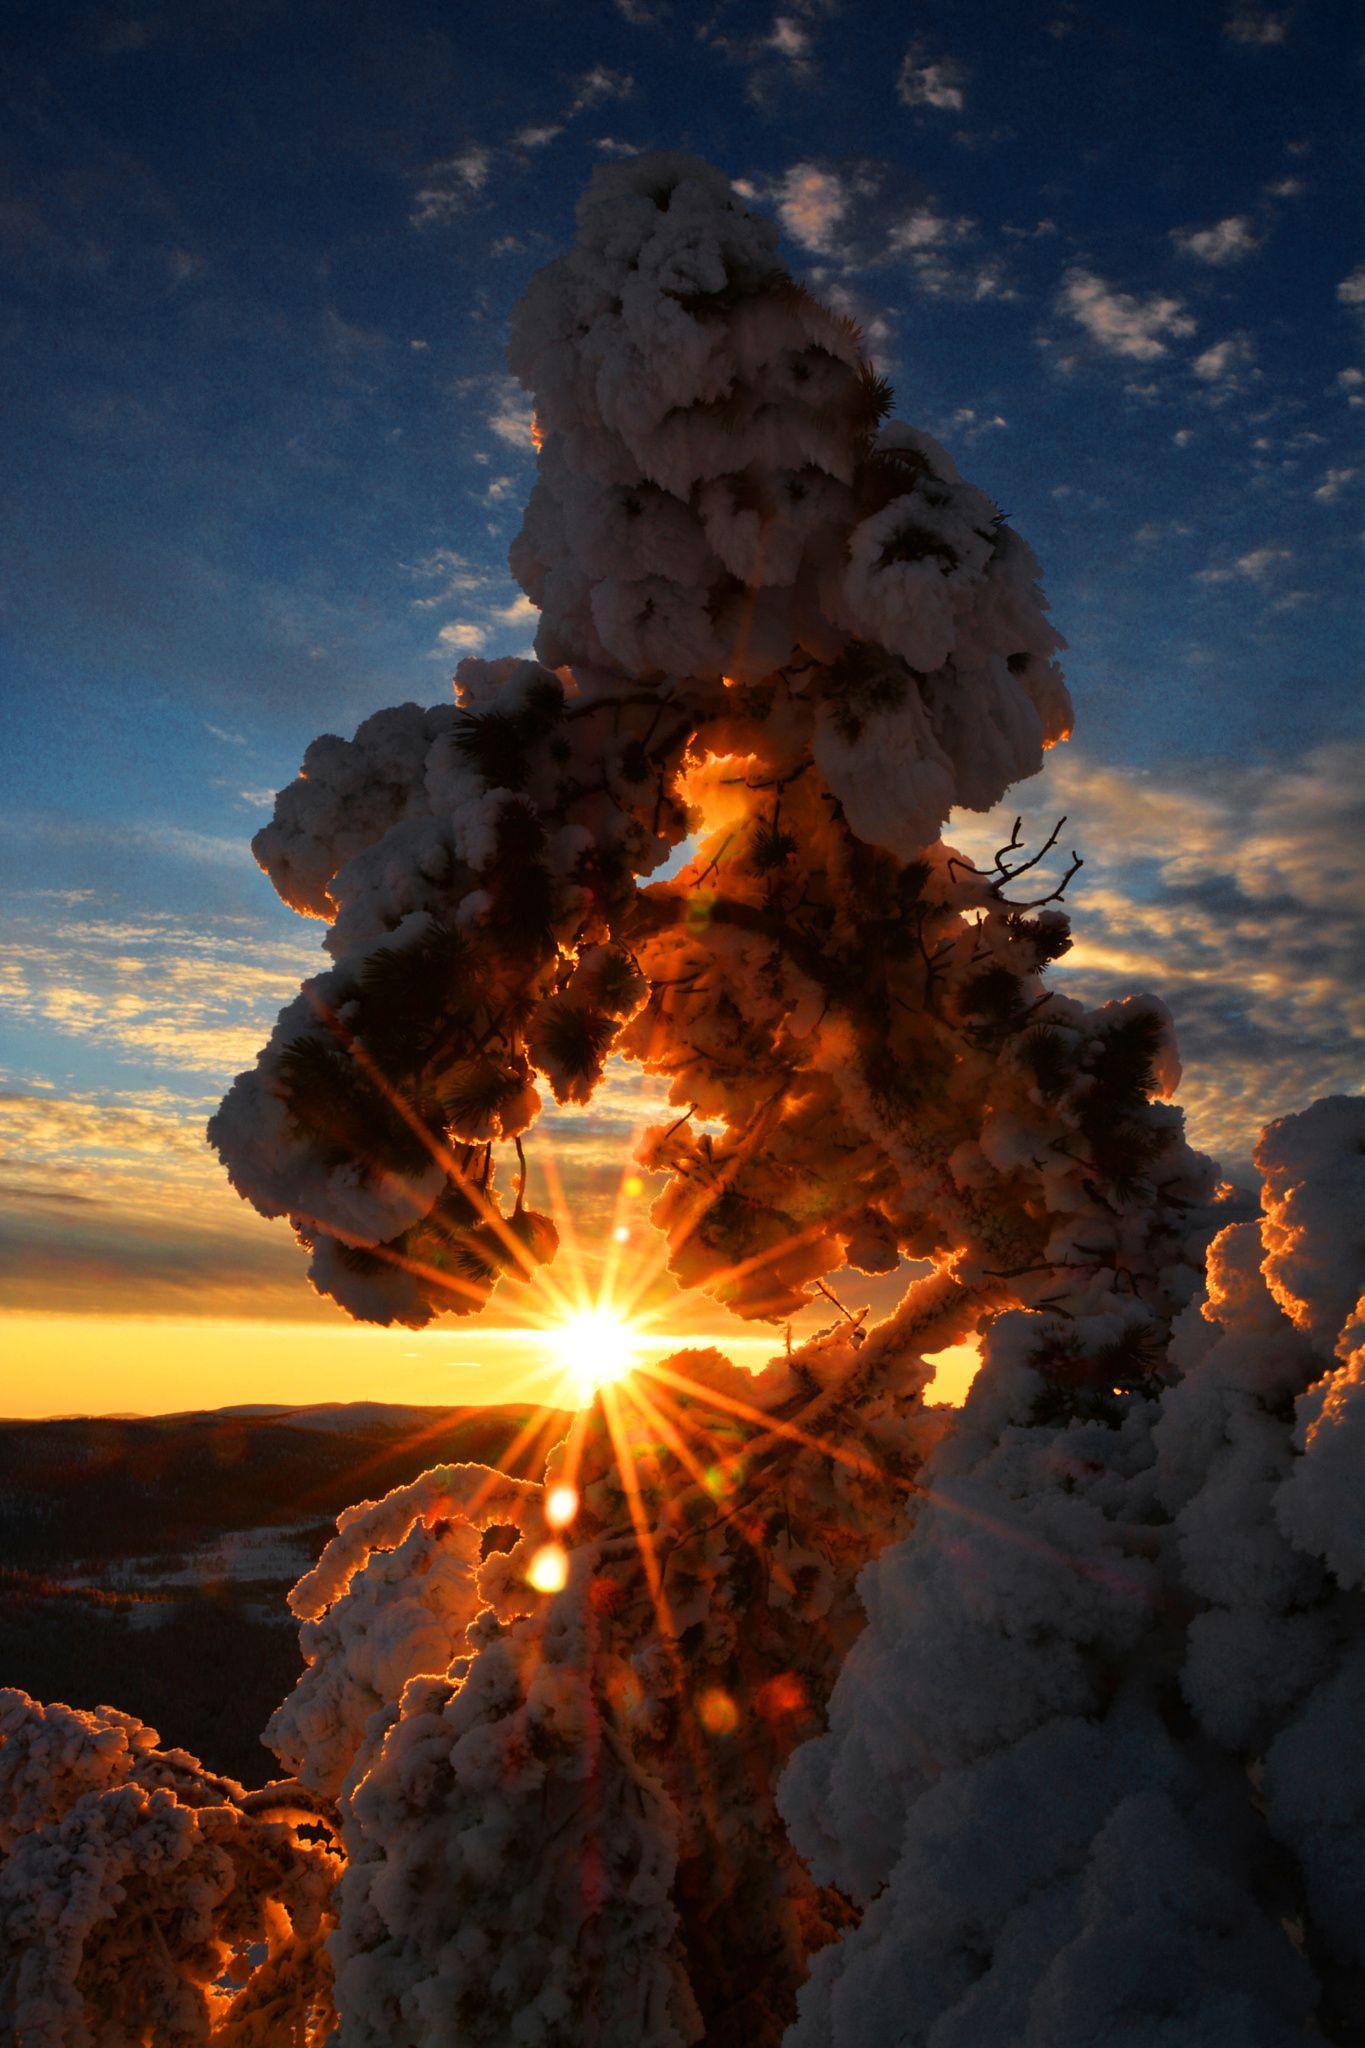 Light peeking through snowy trees in Sweden. Photography by Gonzalo, Navarro.